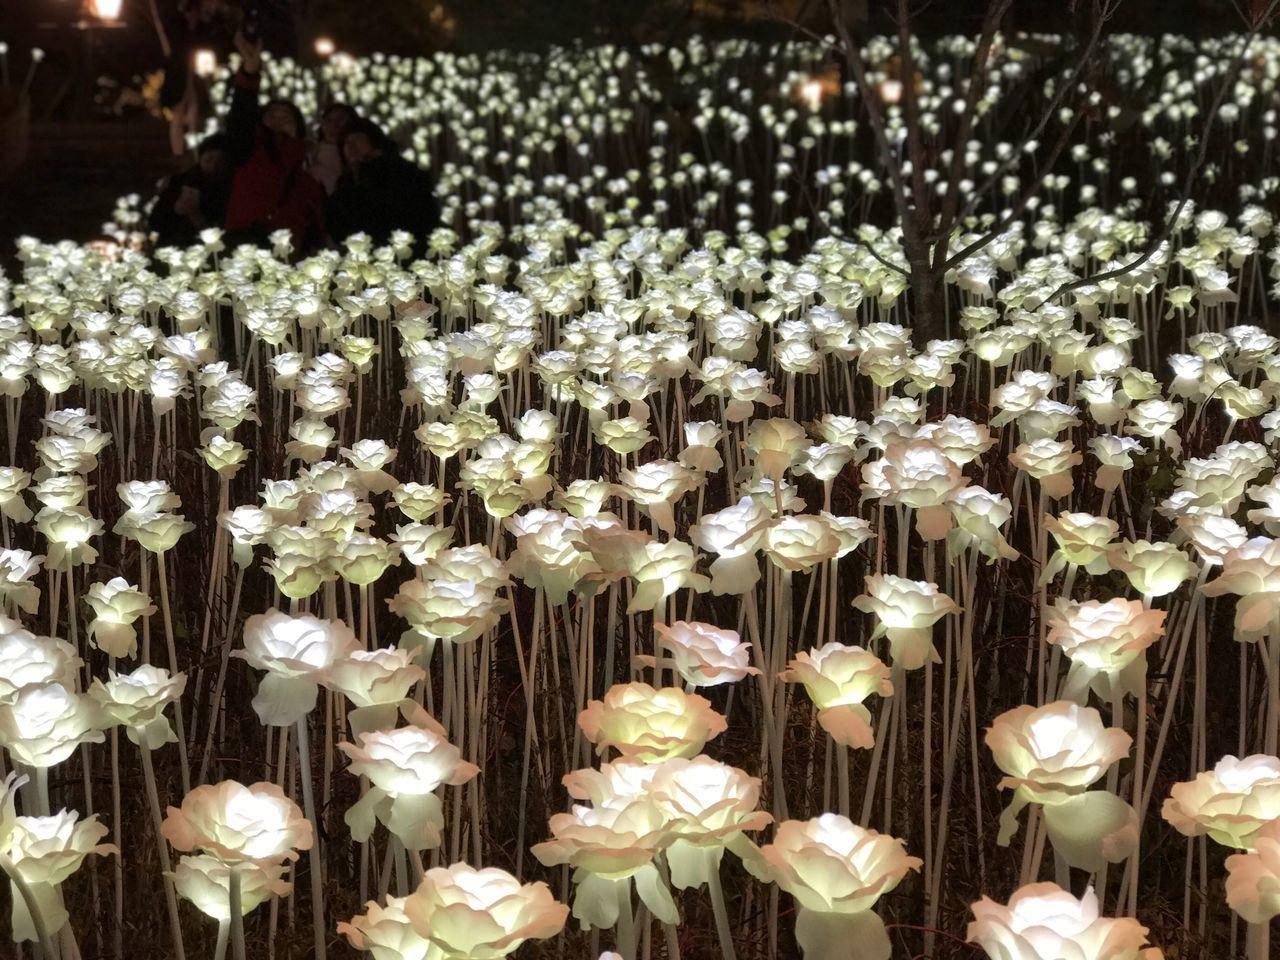 no people, abundance, nature, flower, indoors, close-up, day, flower head